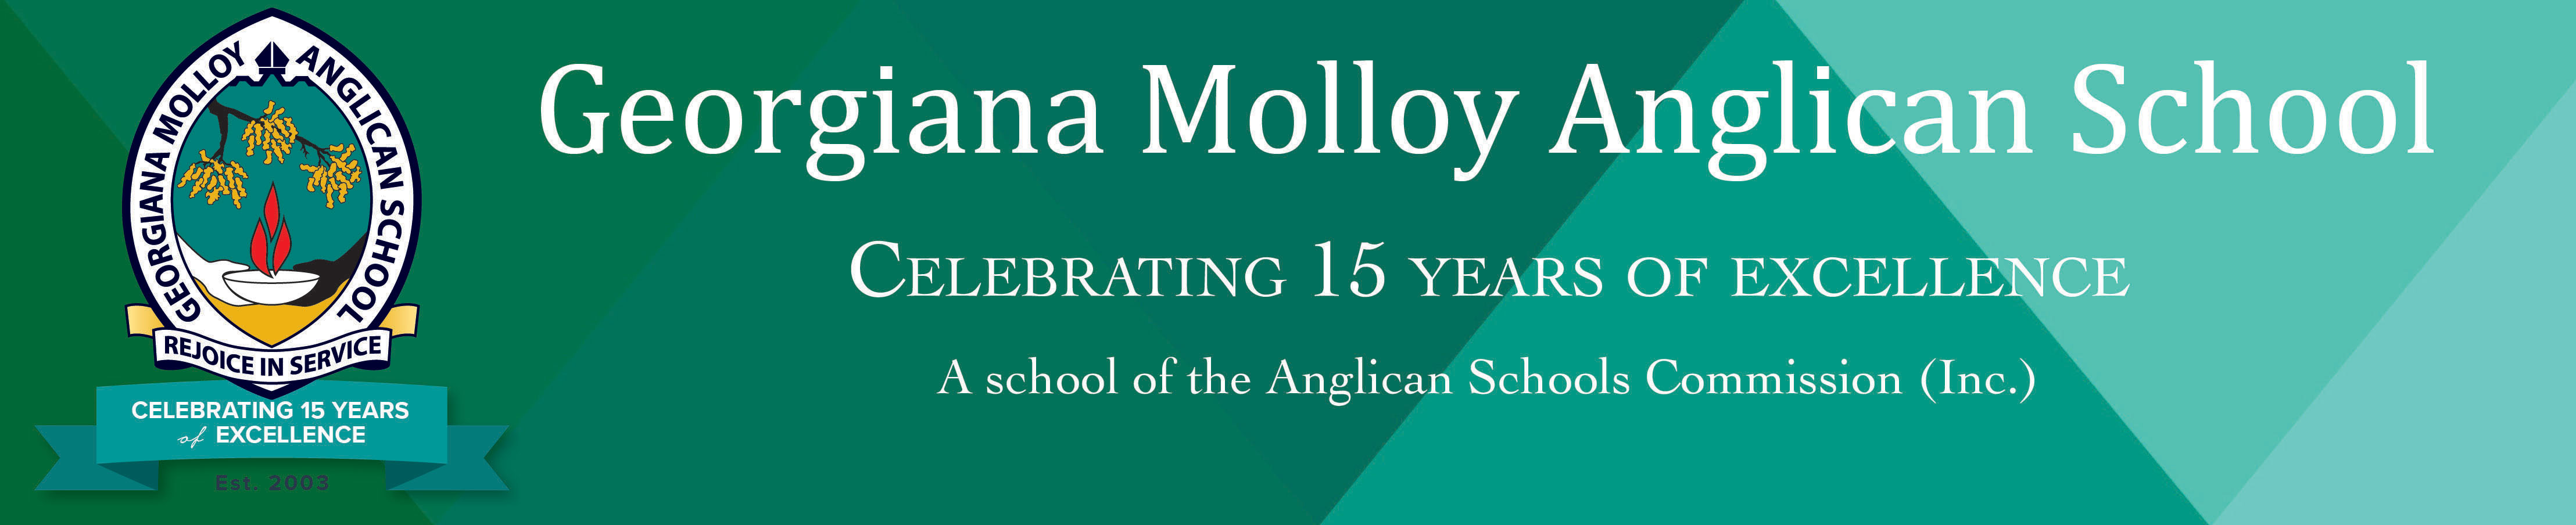 Adventure Works WA Georgiana Molloy Anglican School, Western Australia